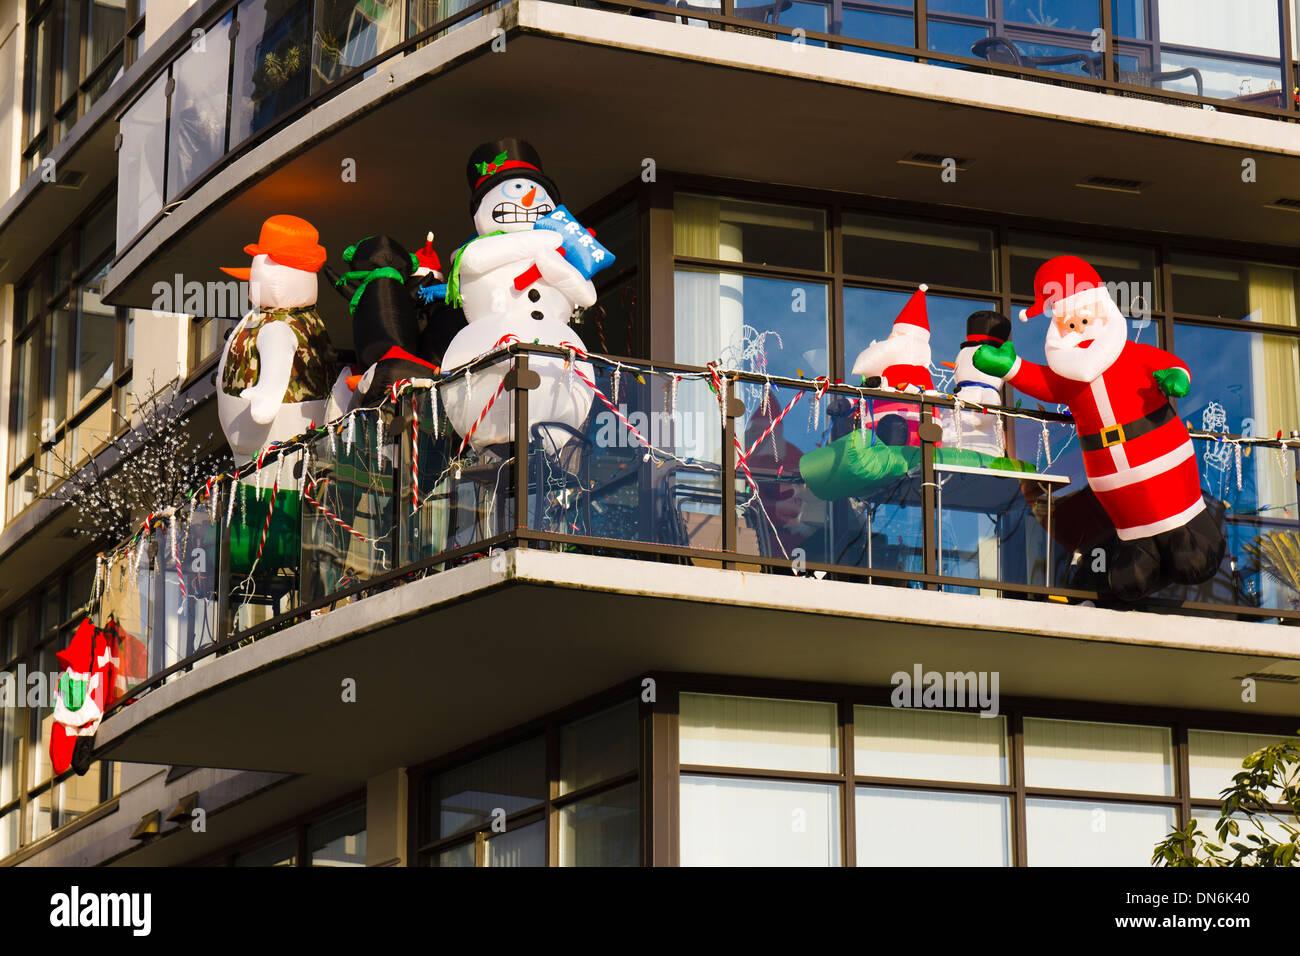 christmas decorations for balcony wwwindiepediaorg